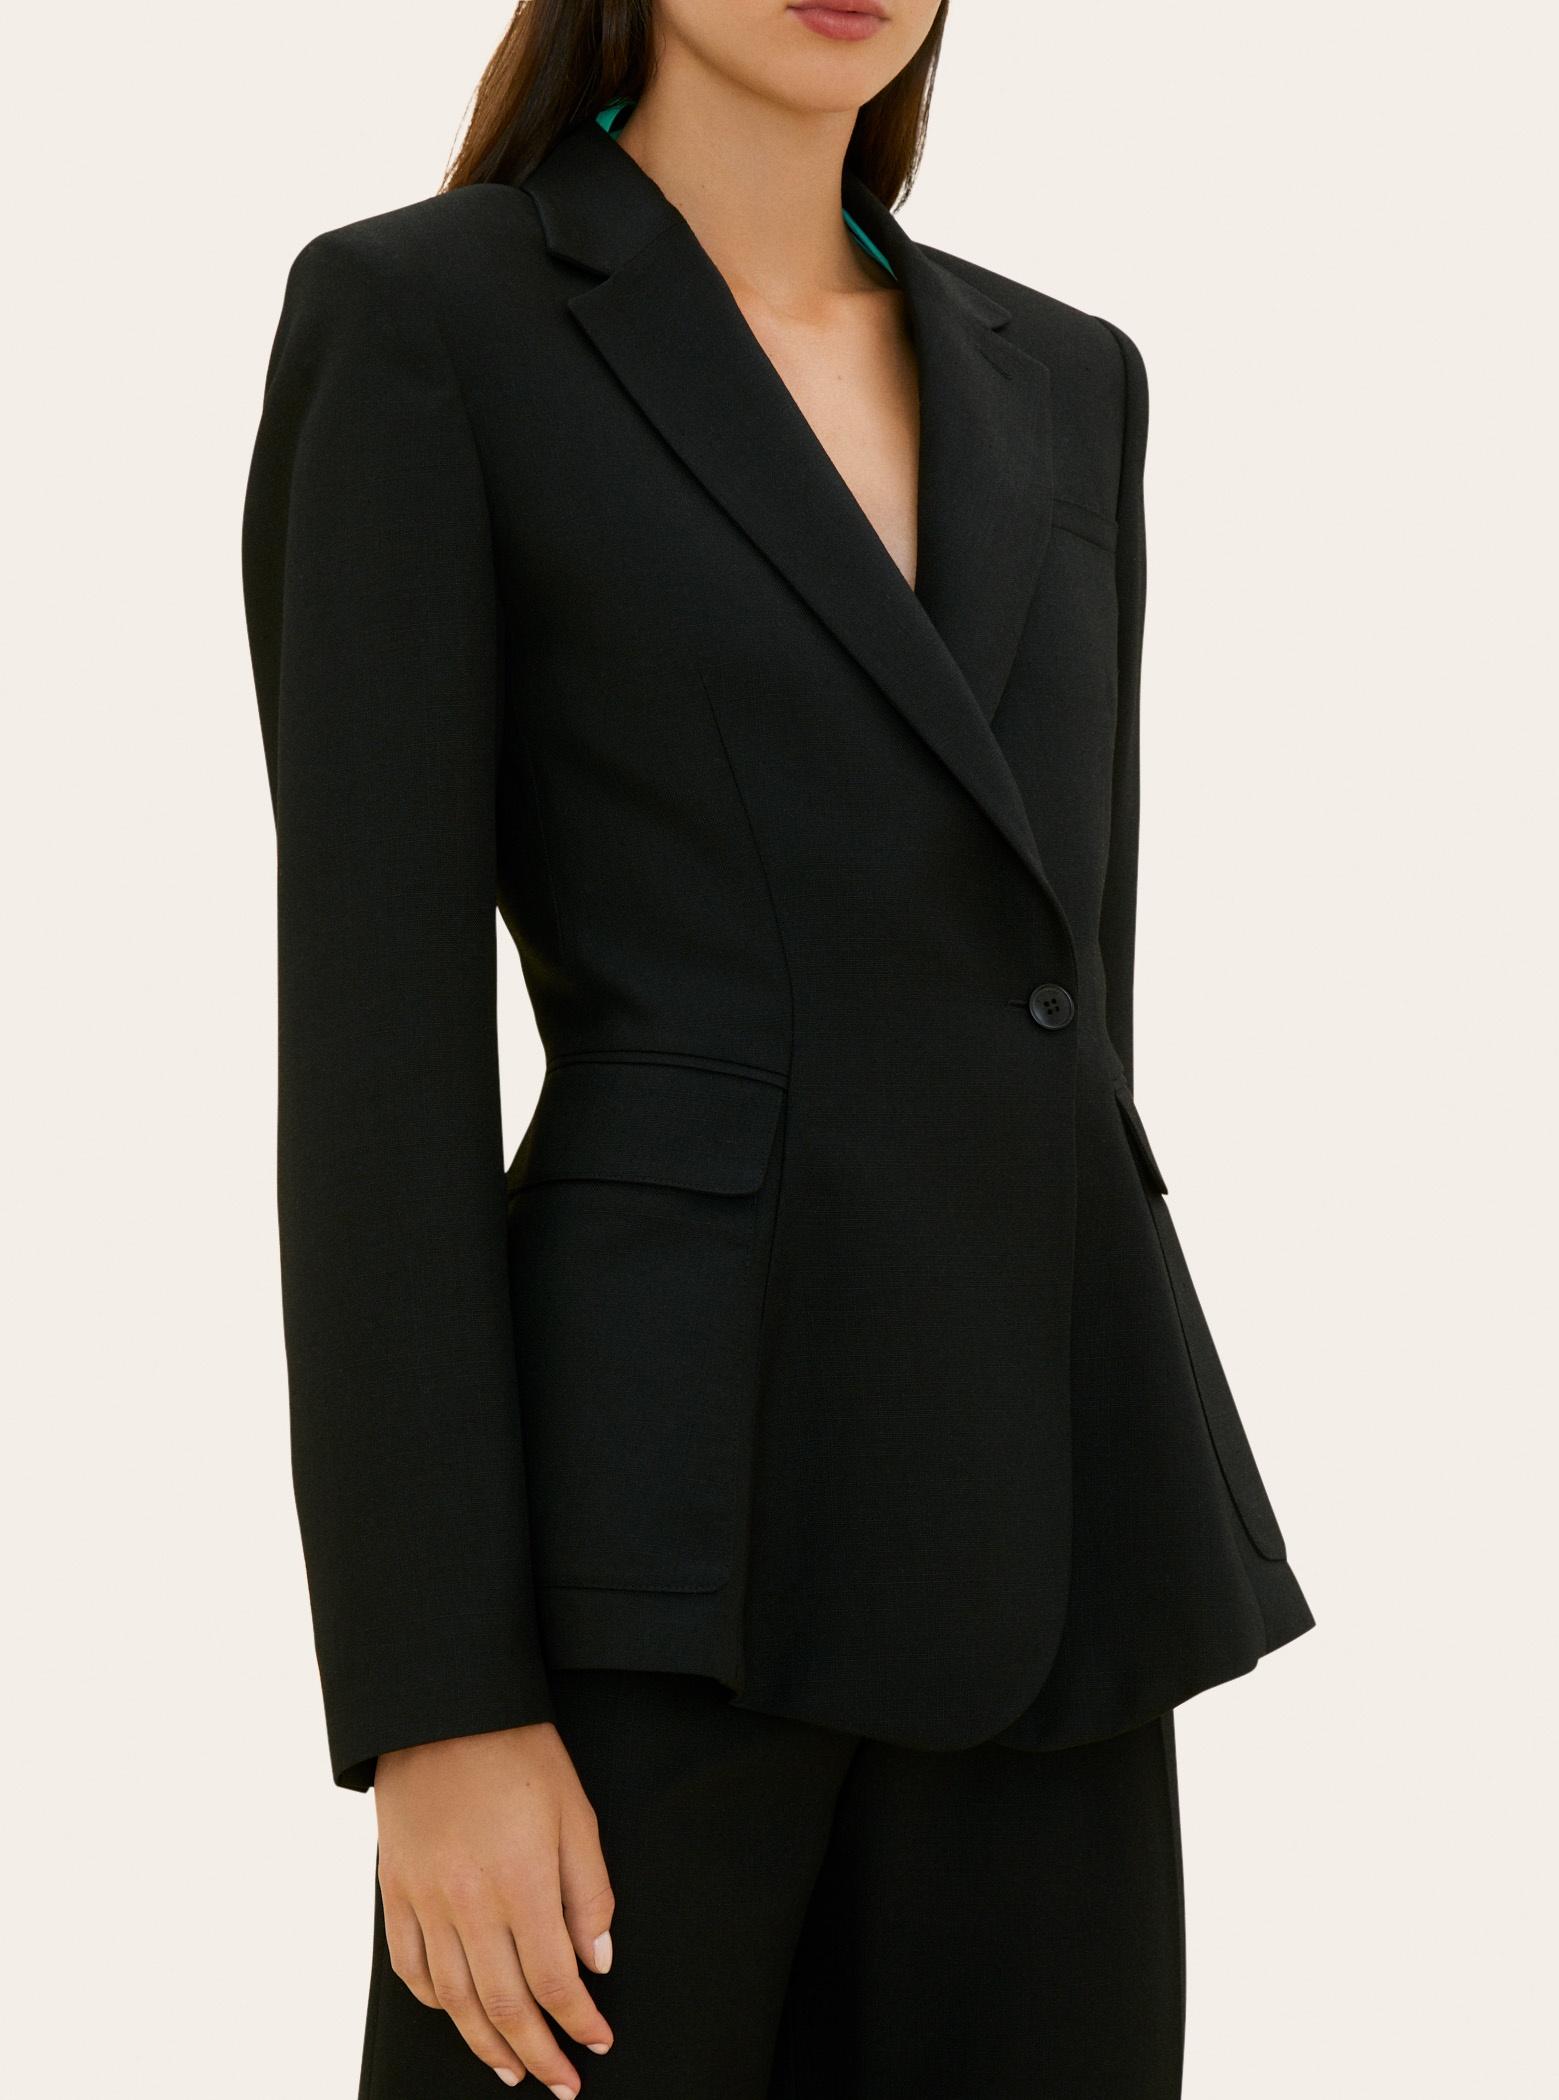 La veste qui vole